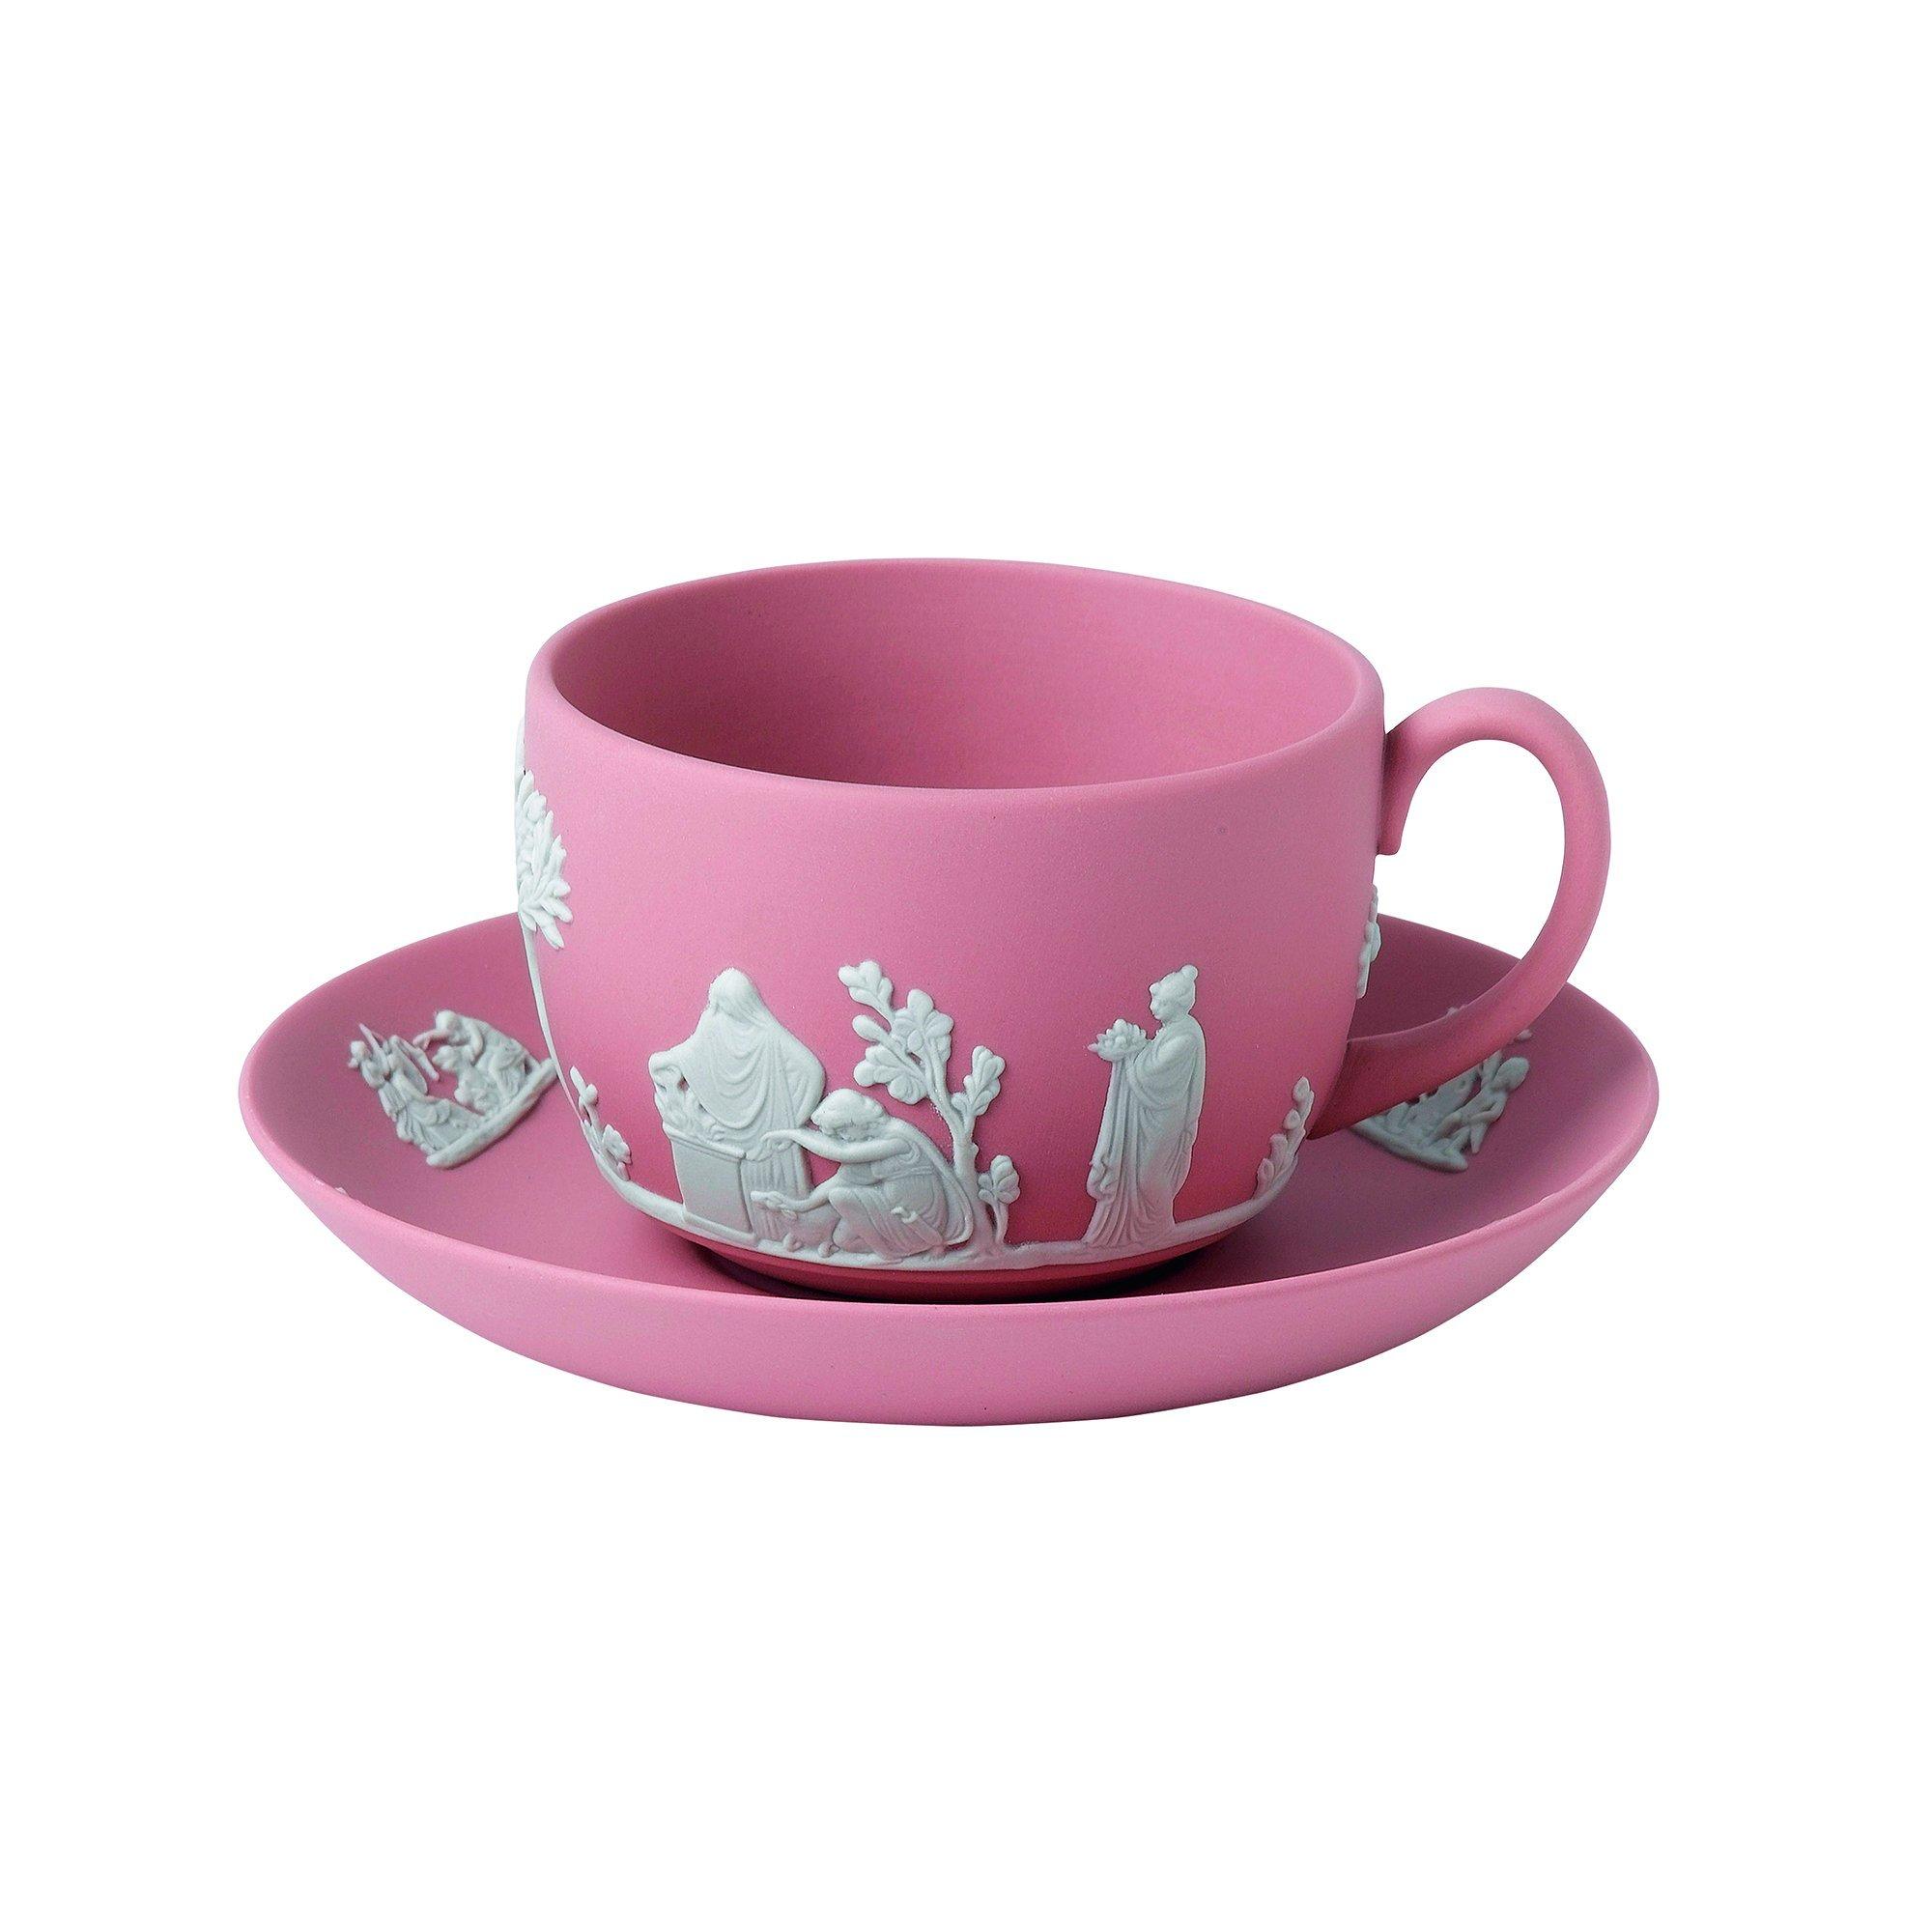 Wedgwood Jasperware Teacup and Saucer, Pink